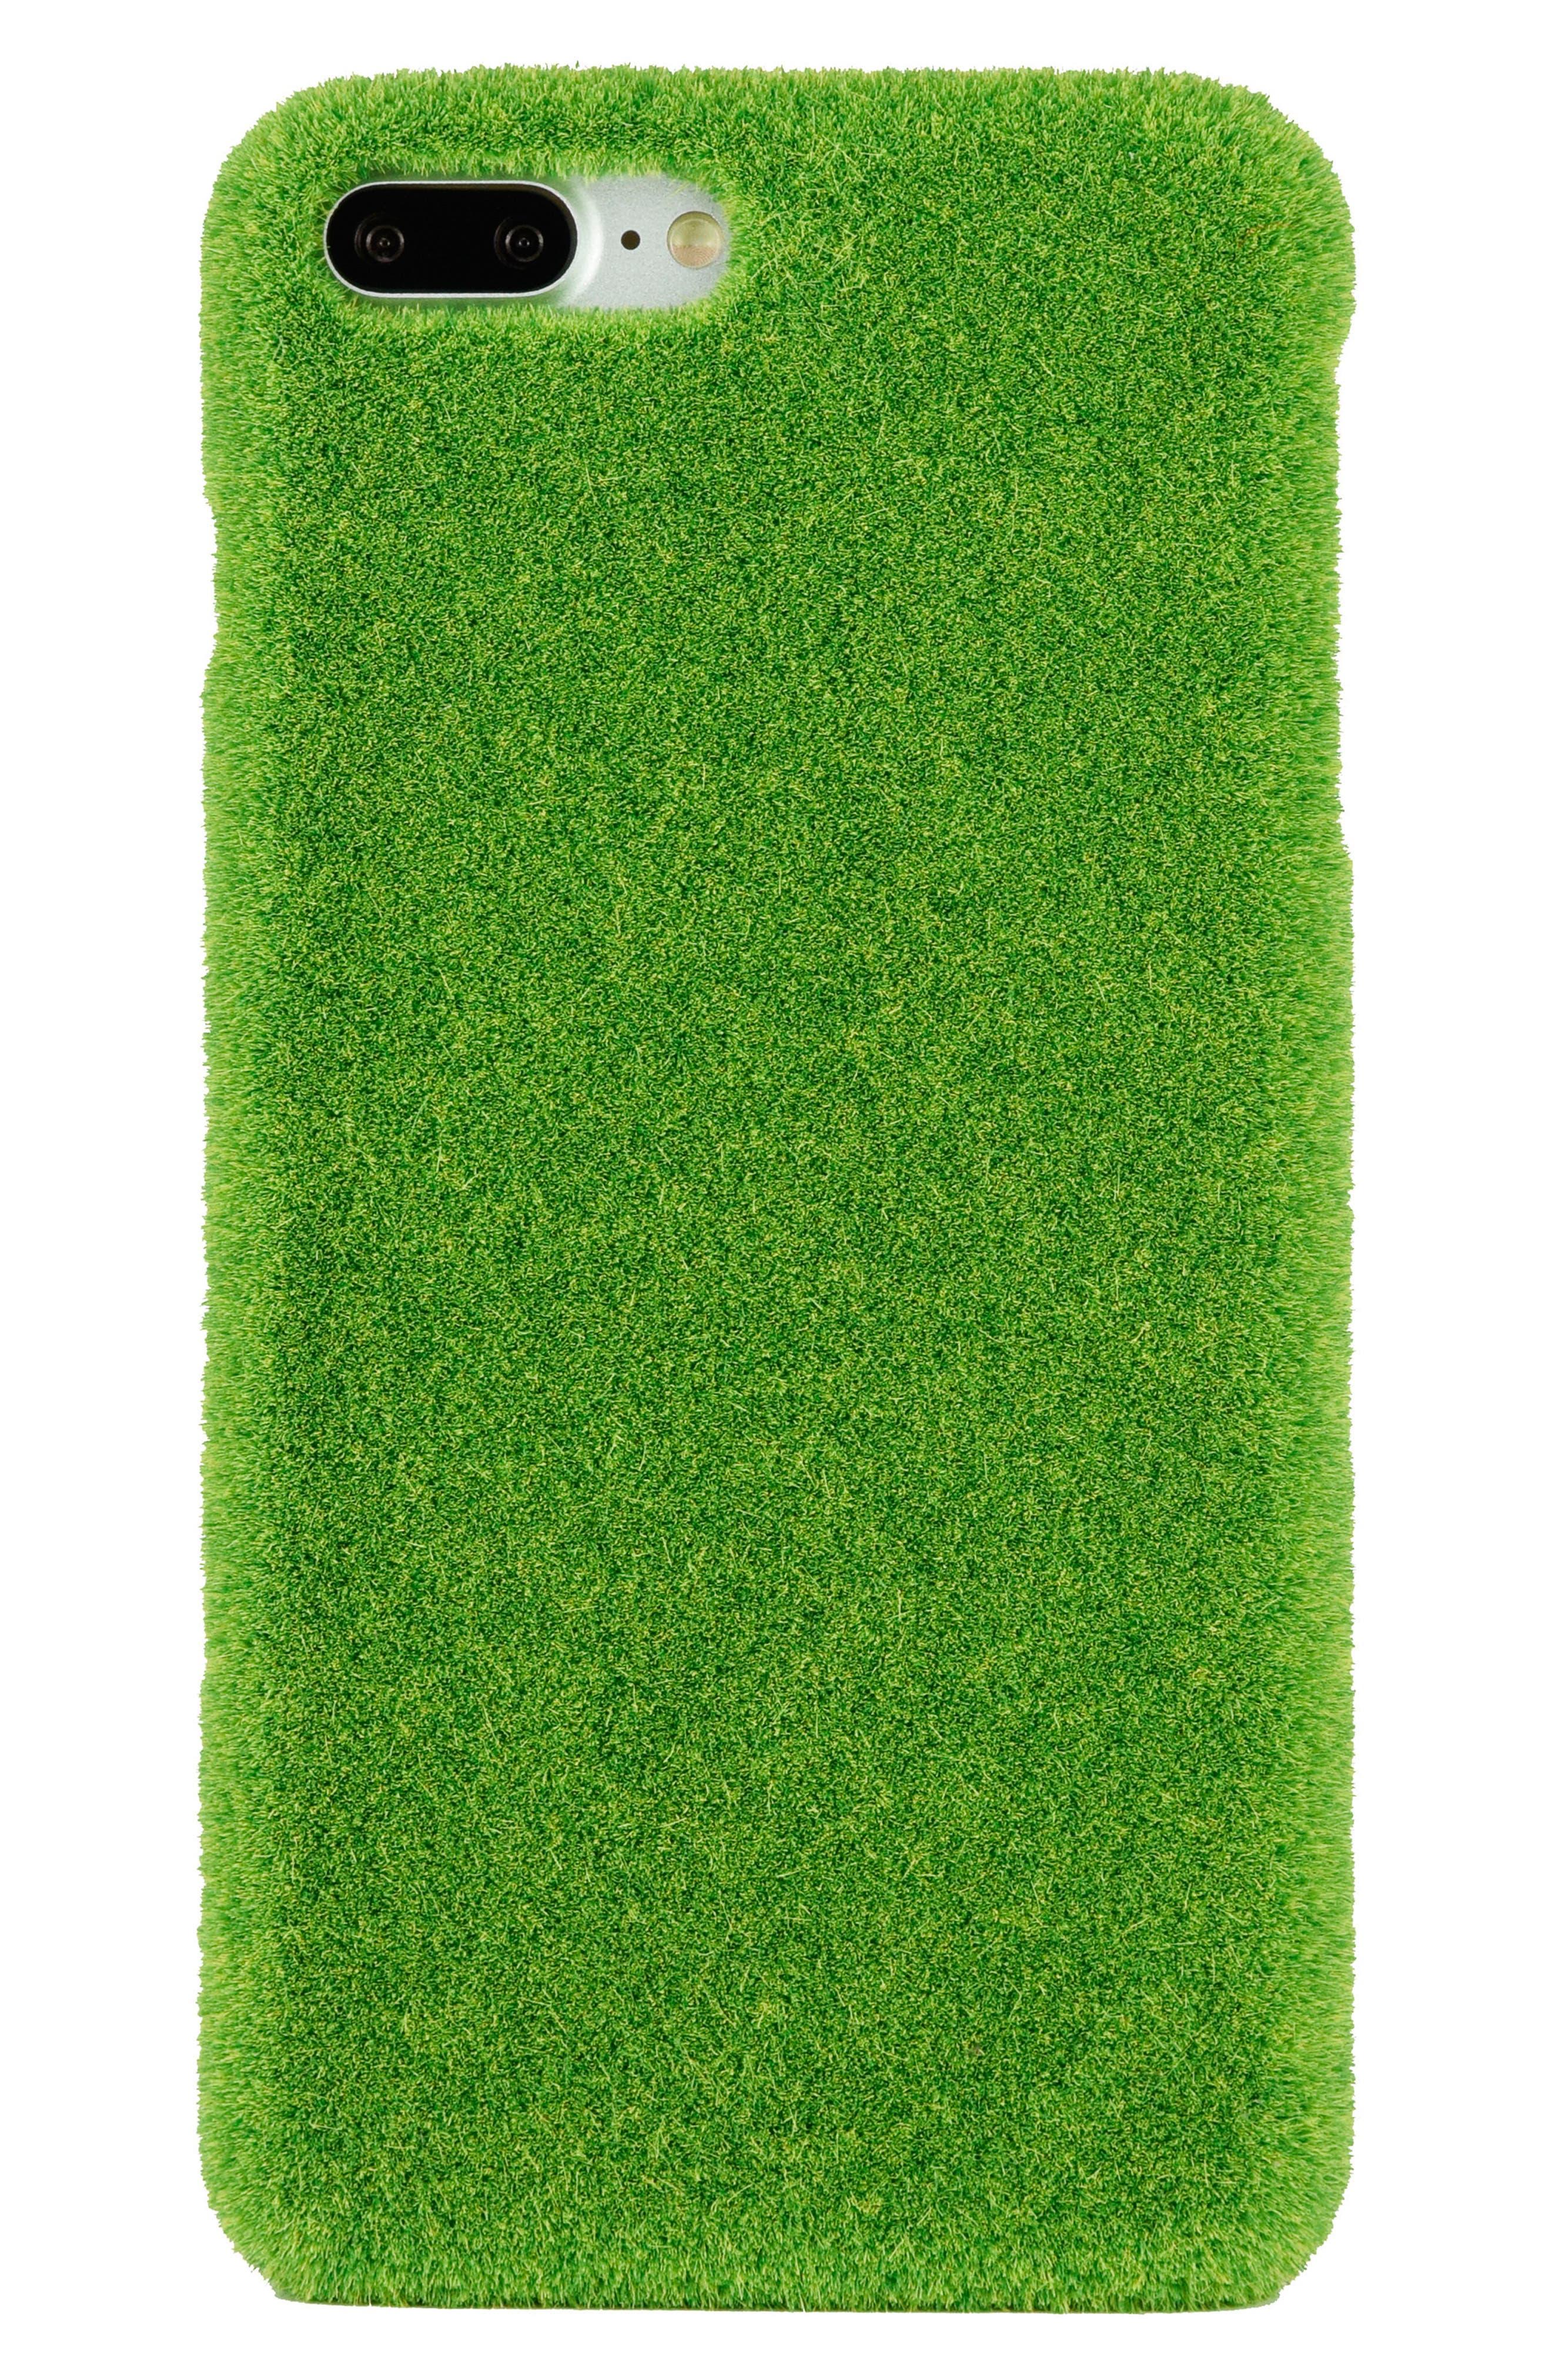 Shibaful Portable Yoyogi Park iPhone 7 & iPhone 7 Plus Case